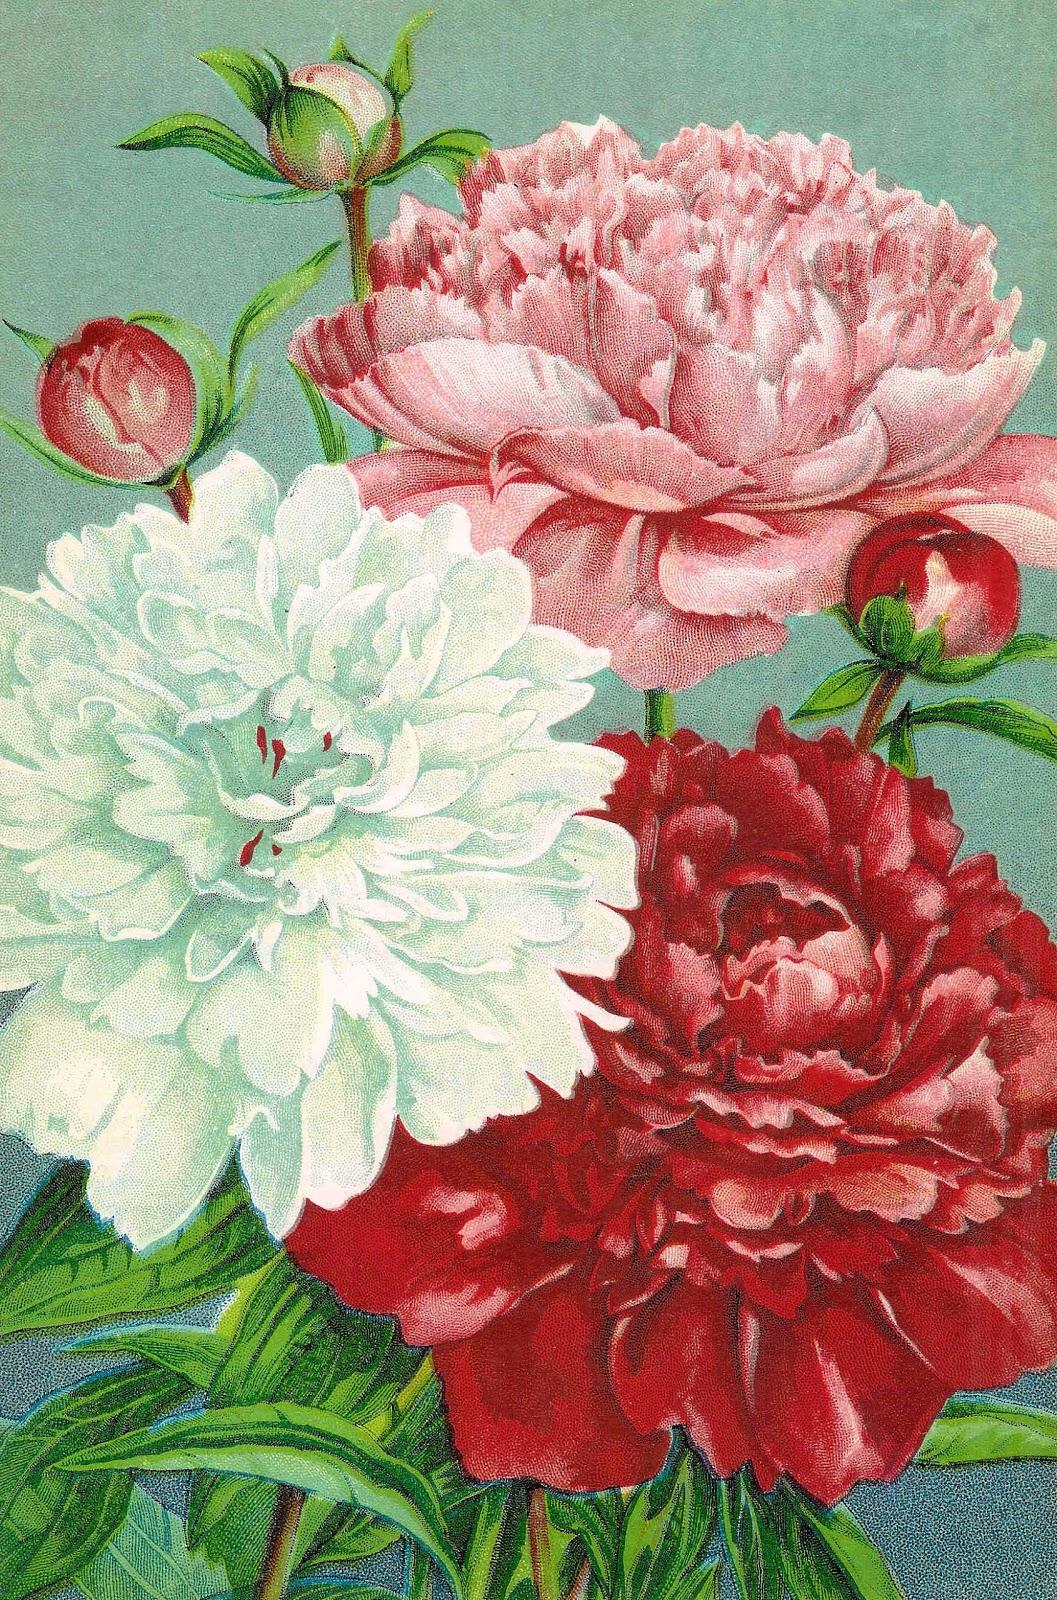 Antique Images: Vintage Flower Clip Art: Pink, Red, and ... (1057 x 1600 Pixel)